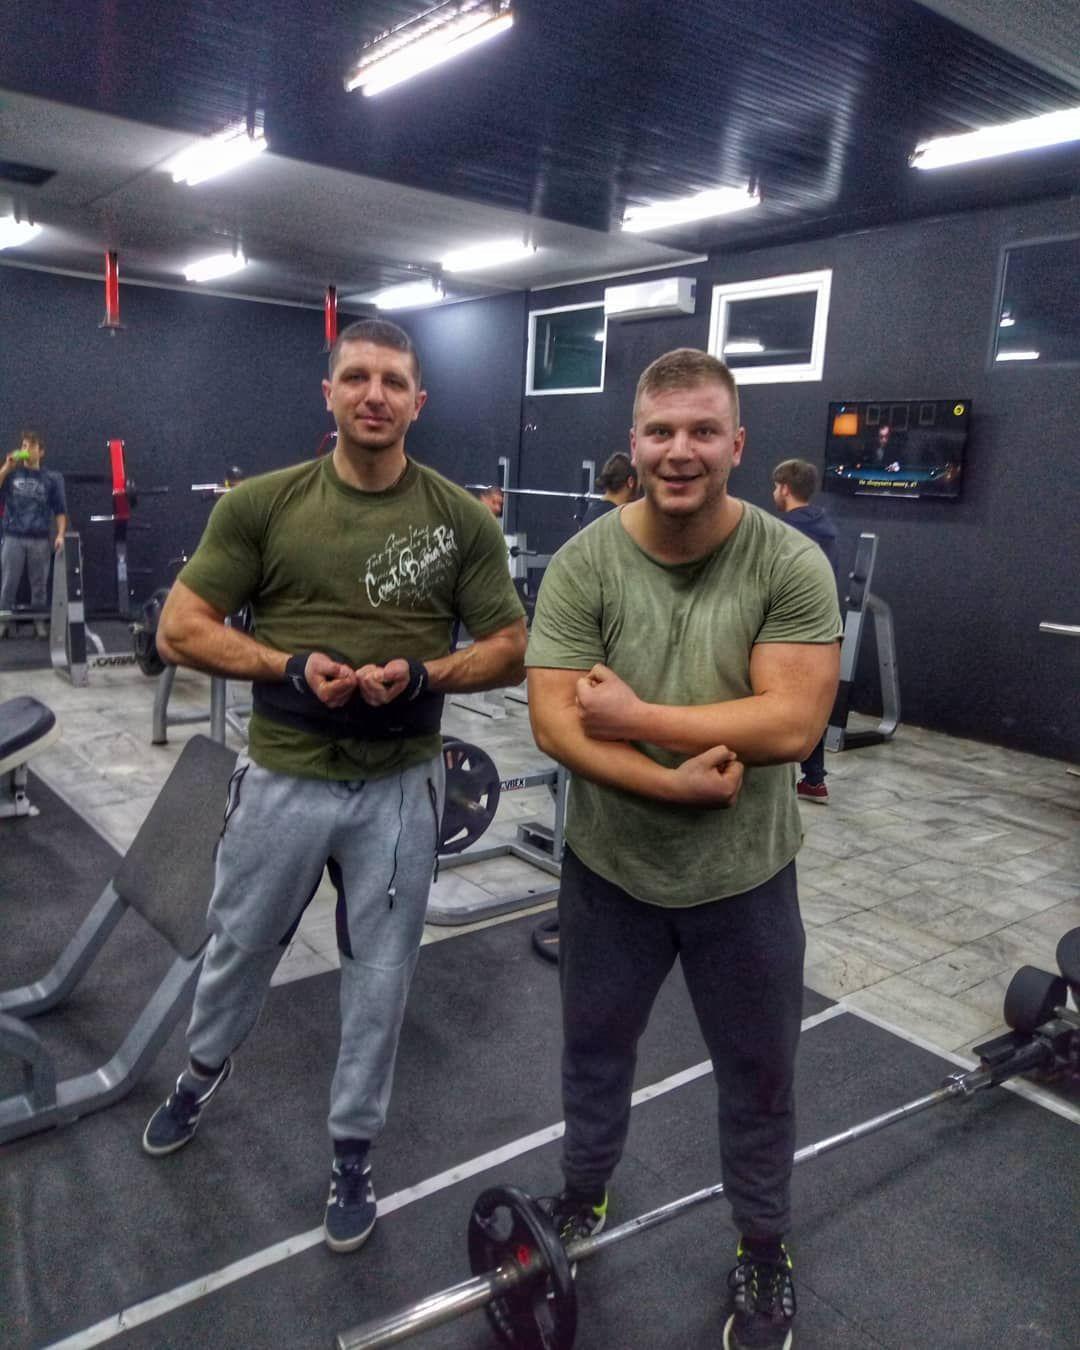 #gym #fitness #bodybuilding #legday #workout #workoutmotivation #workhard #natural #squats #gymmotiv...